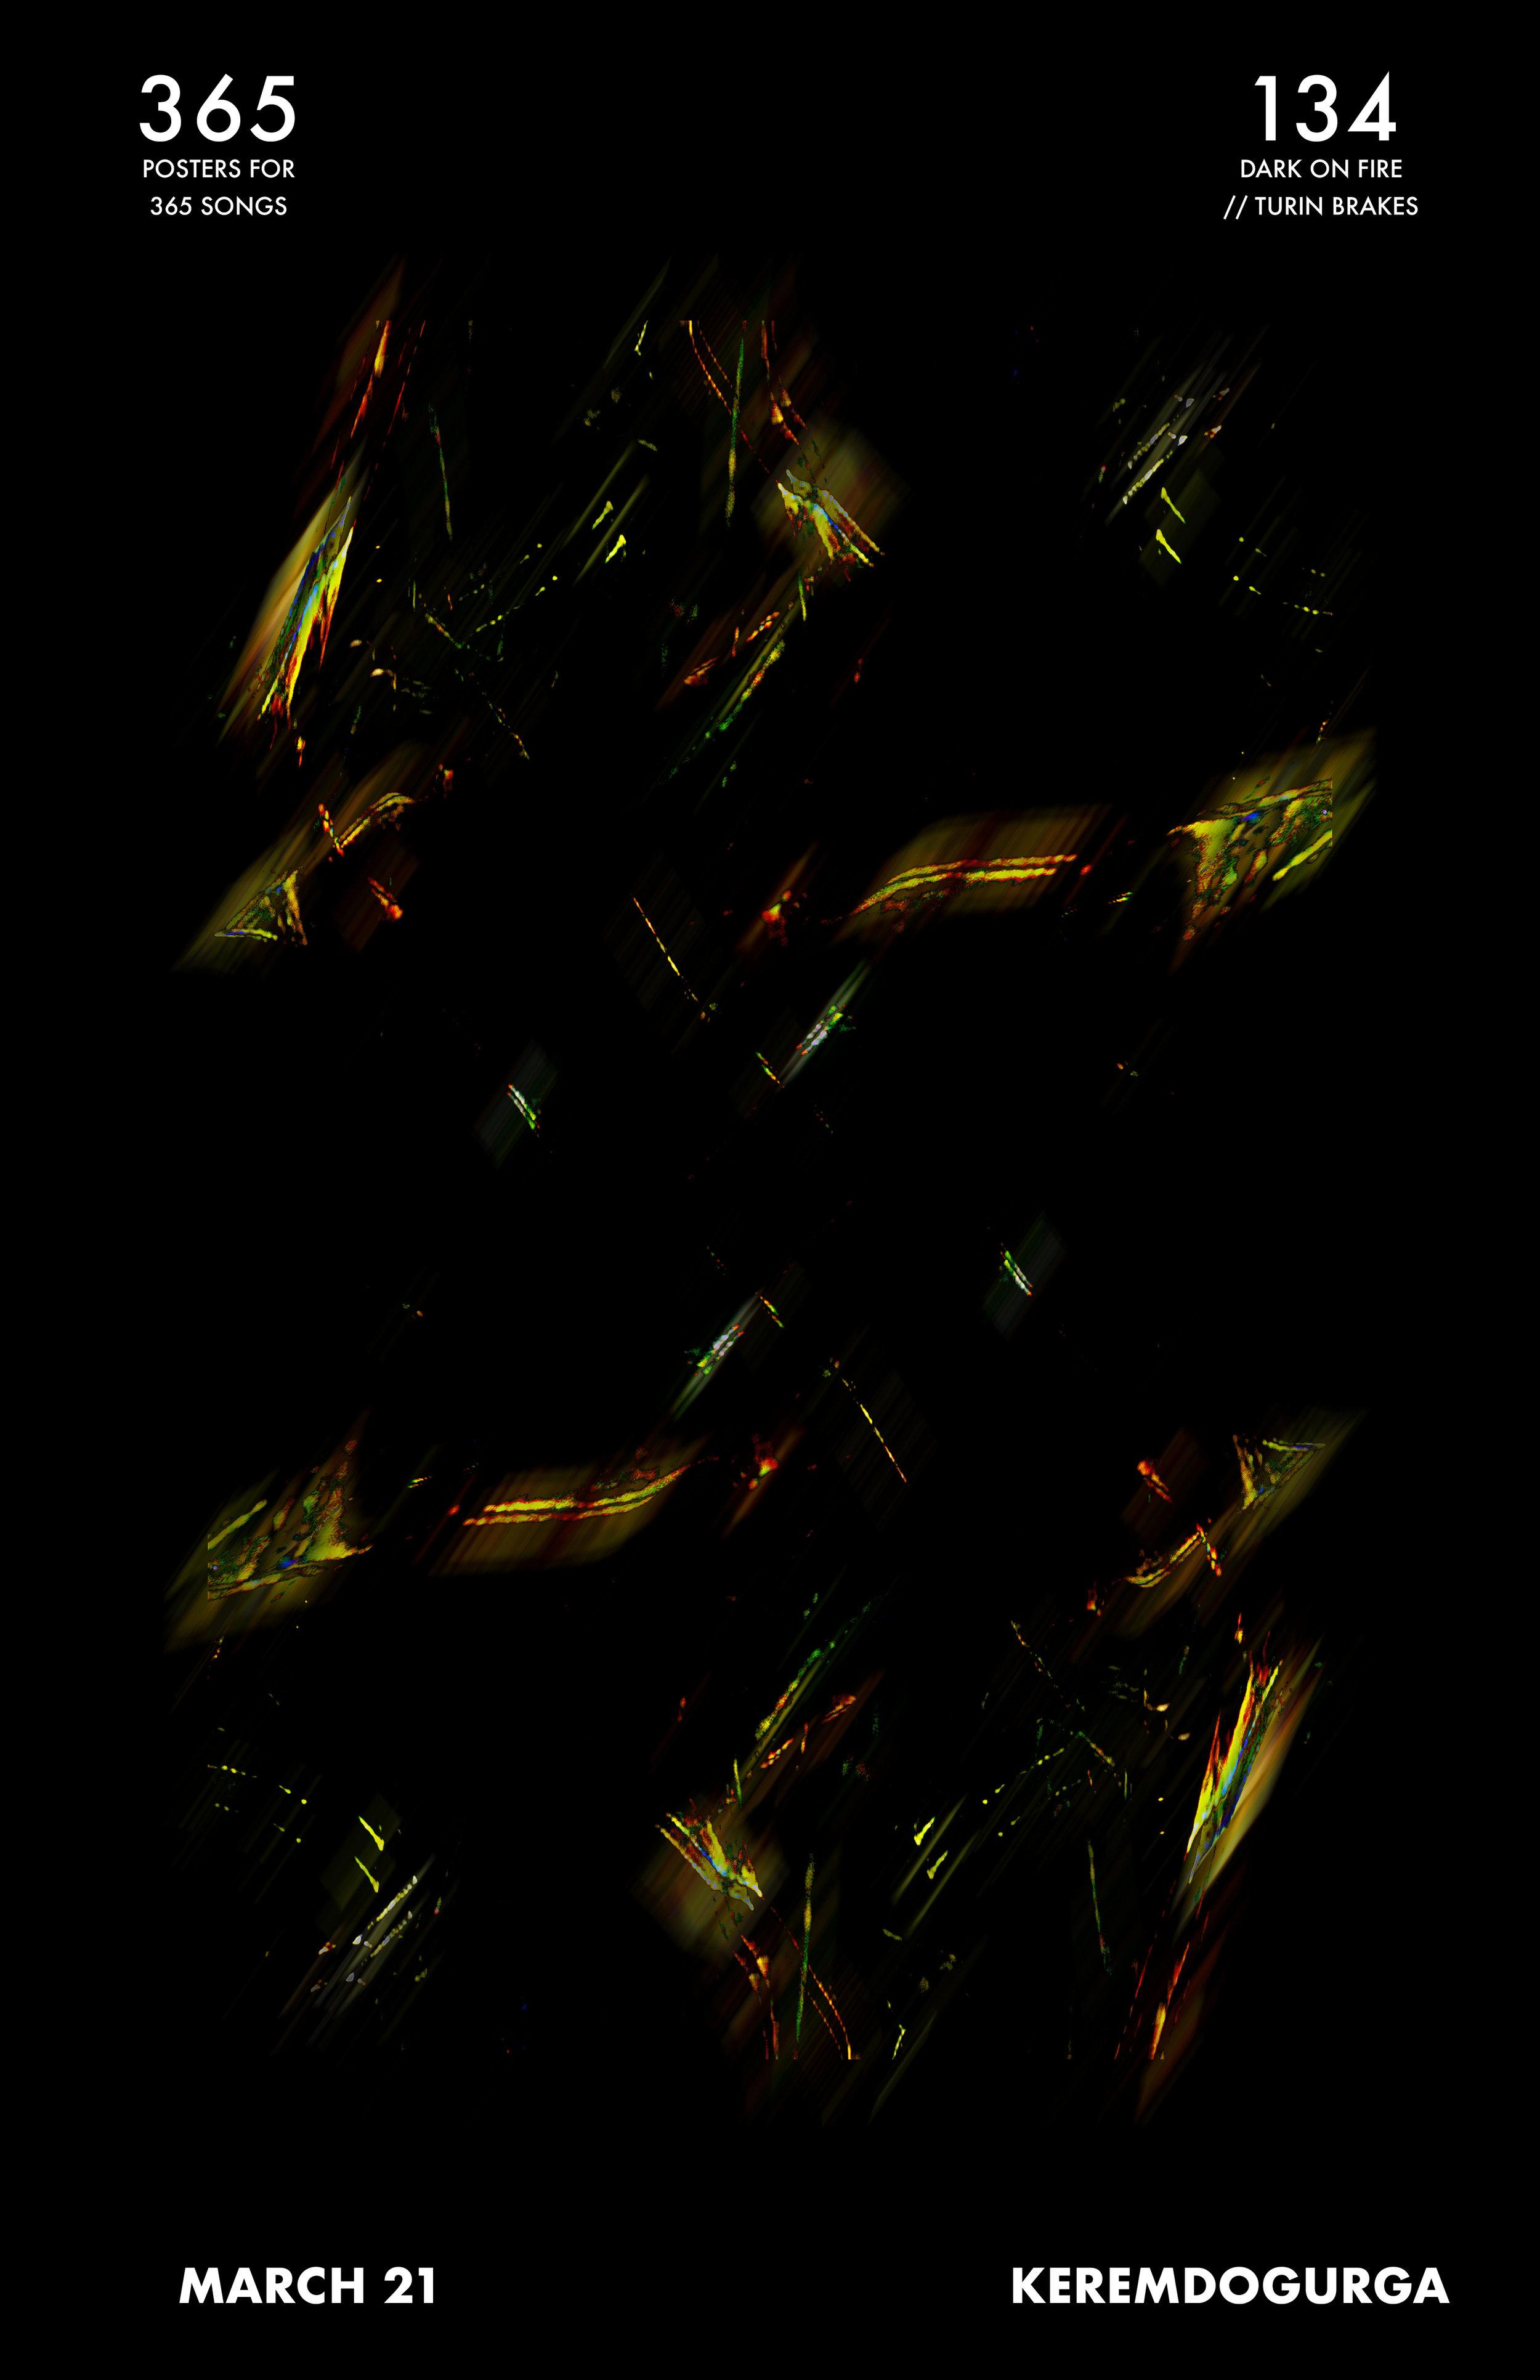 134 Dark on Fire // Turin Brakes